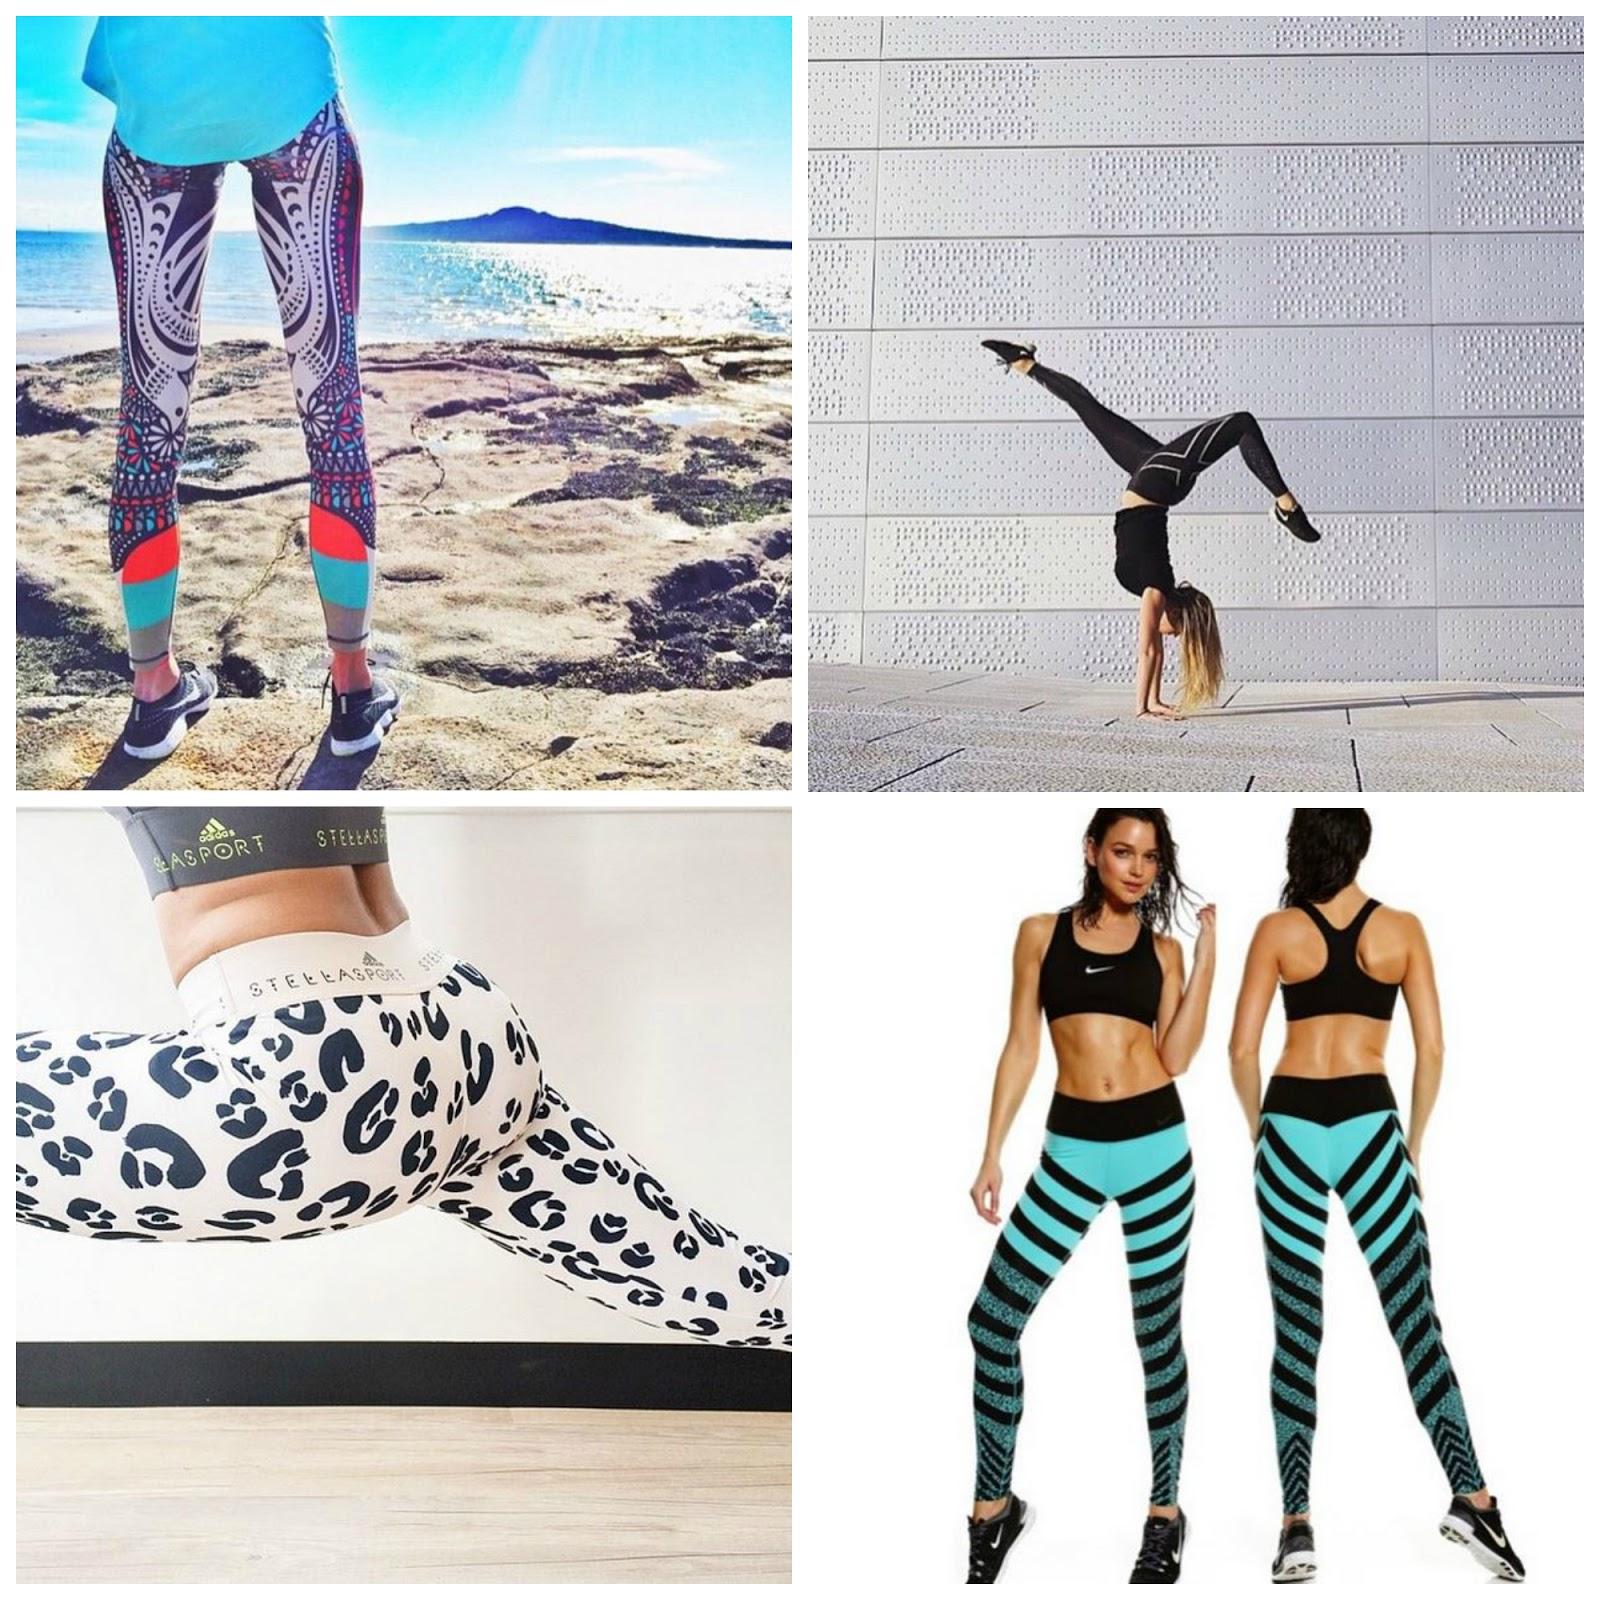 Legs and Abs circuit training - ph. Stylerunner